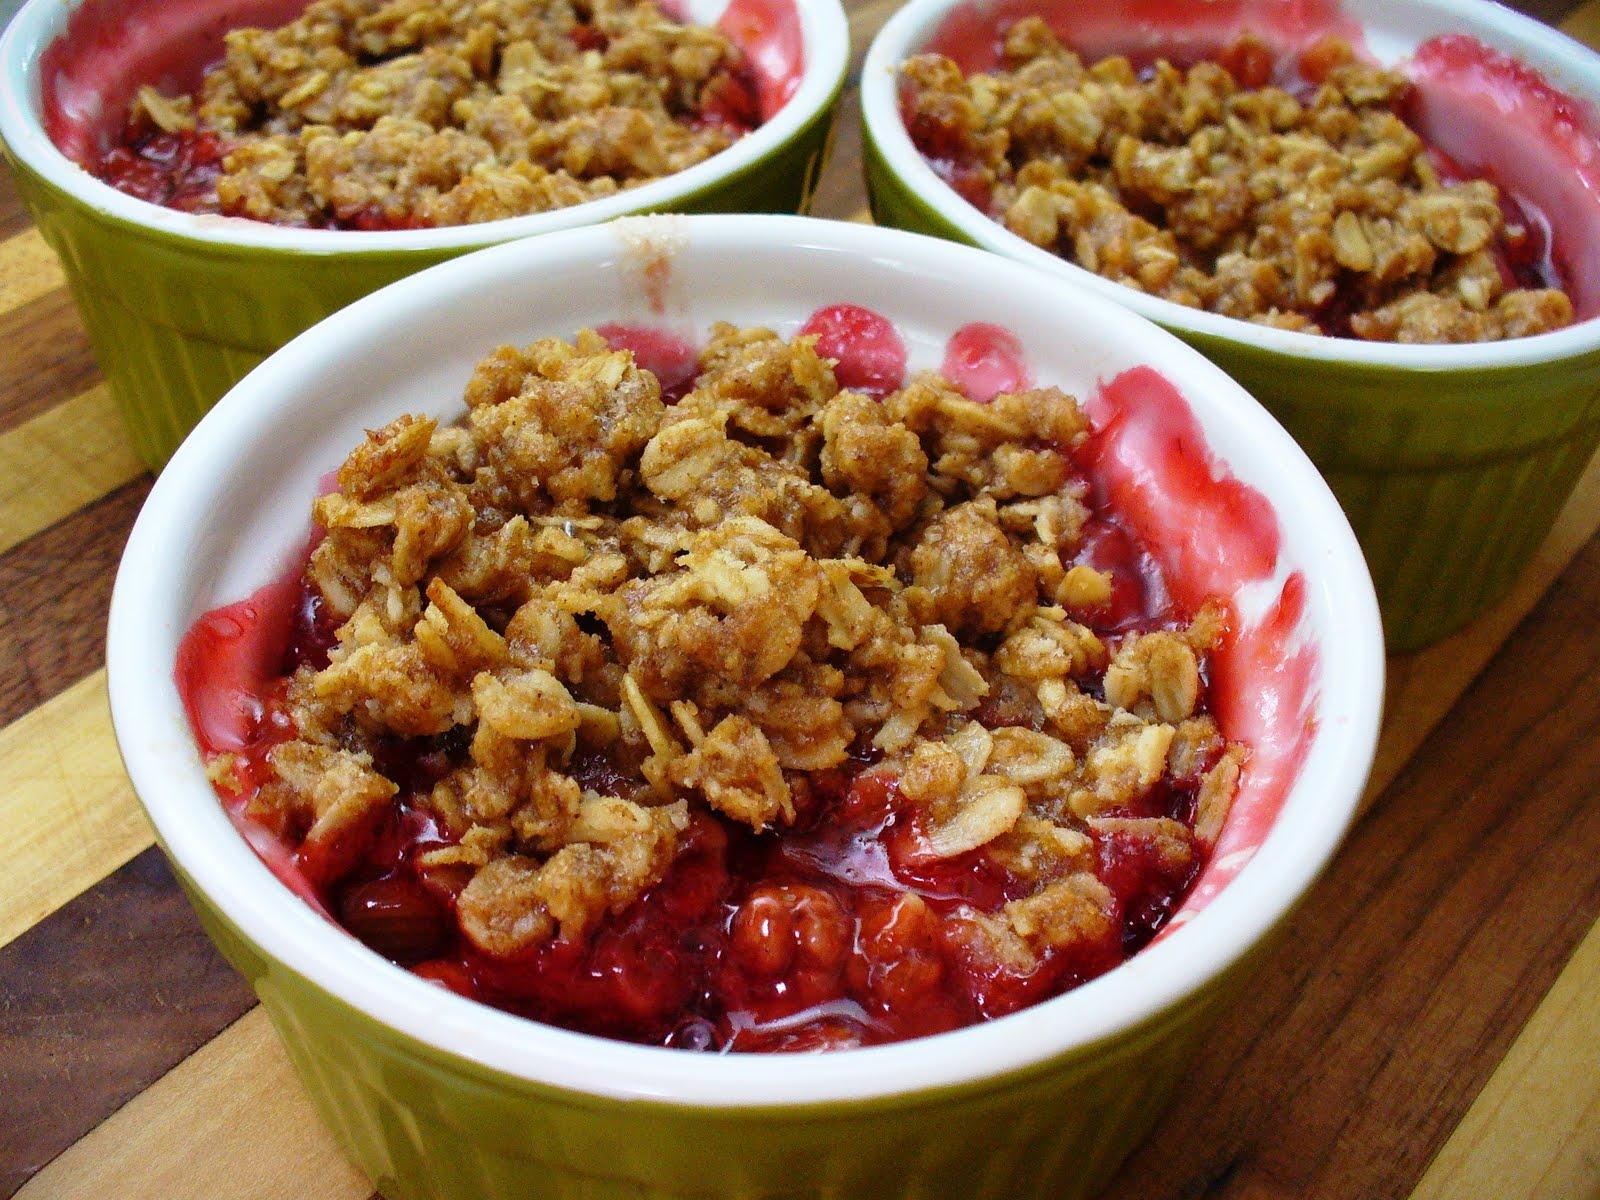 Leenees Sweetest Delights  Rhubarb Strawberry Crisp